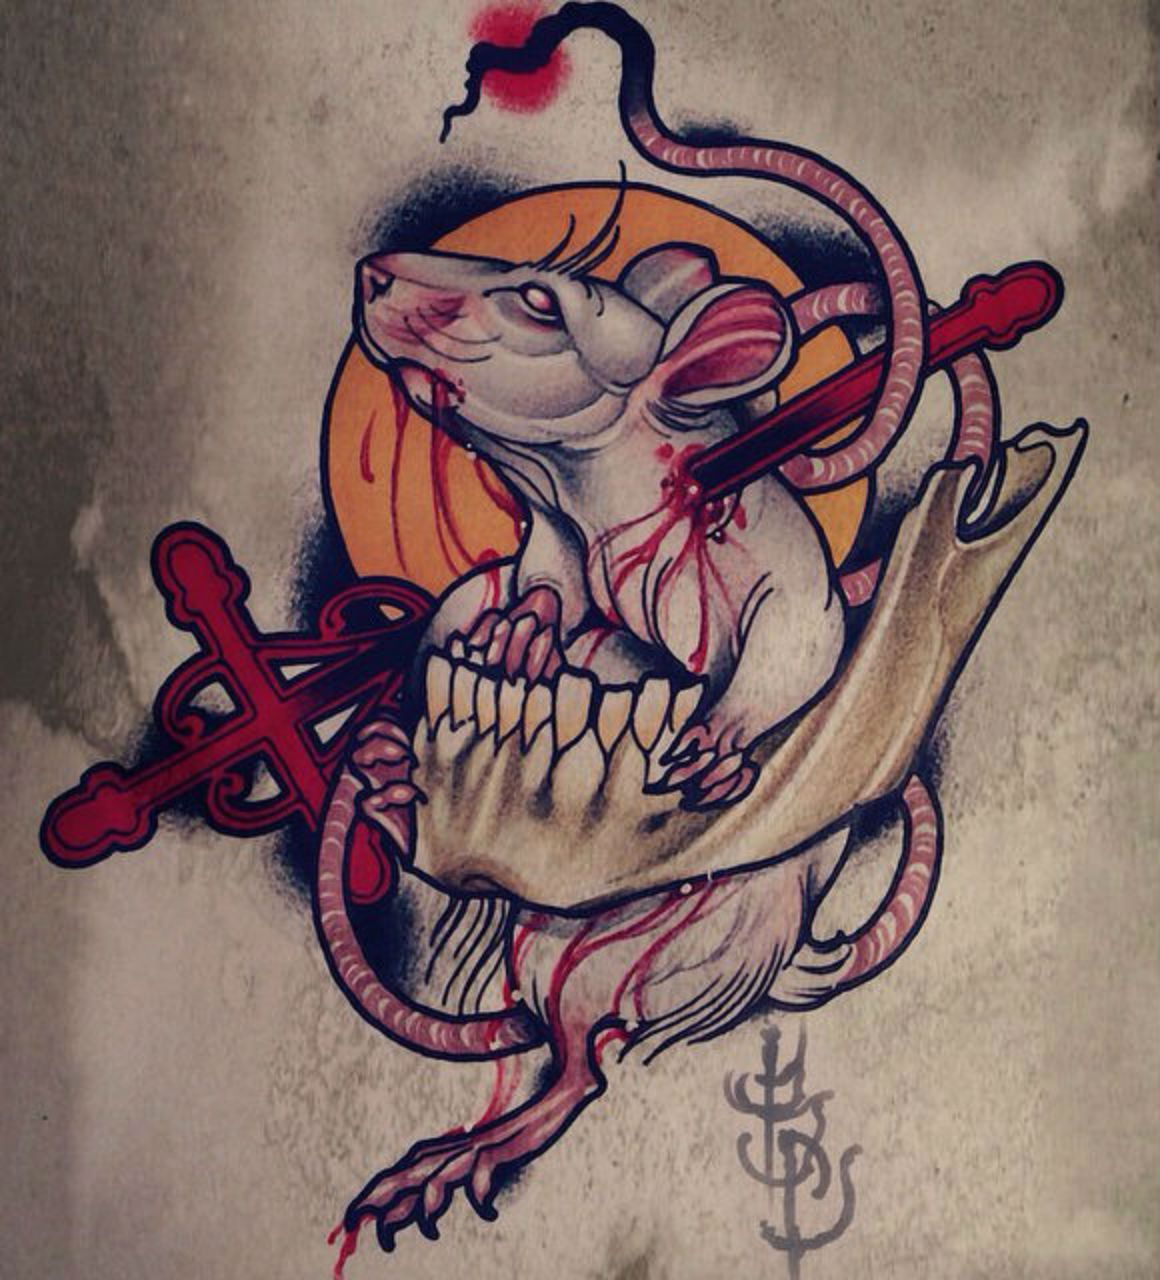 brando chiesa tattoo flash pinterest tattoo neo traditional and tattoo flash. Black Bedroom Furniture Sets. Home Design Ideas